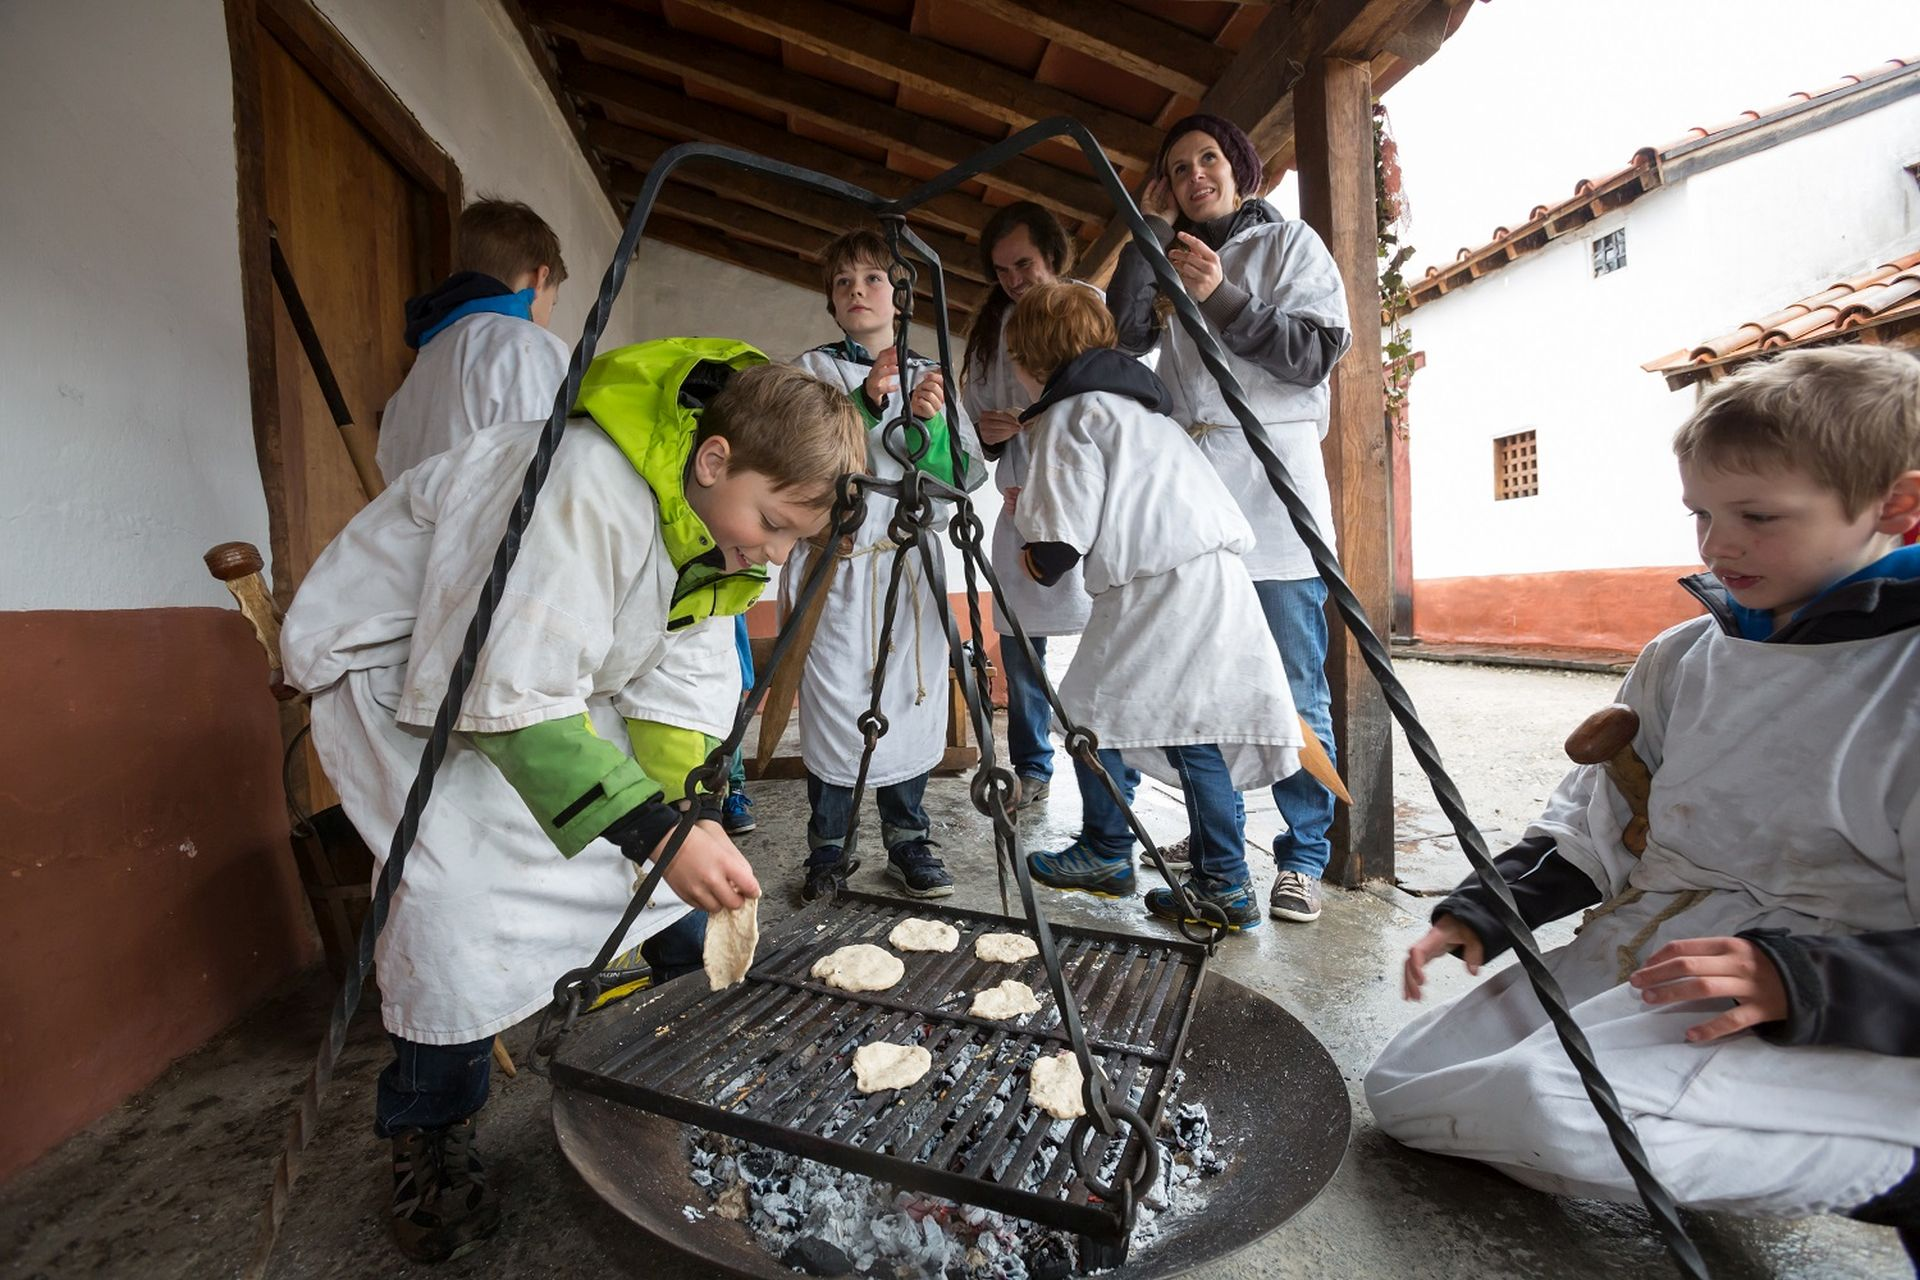 kochen Am Legionärspfad als Römer gekleidet